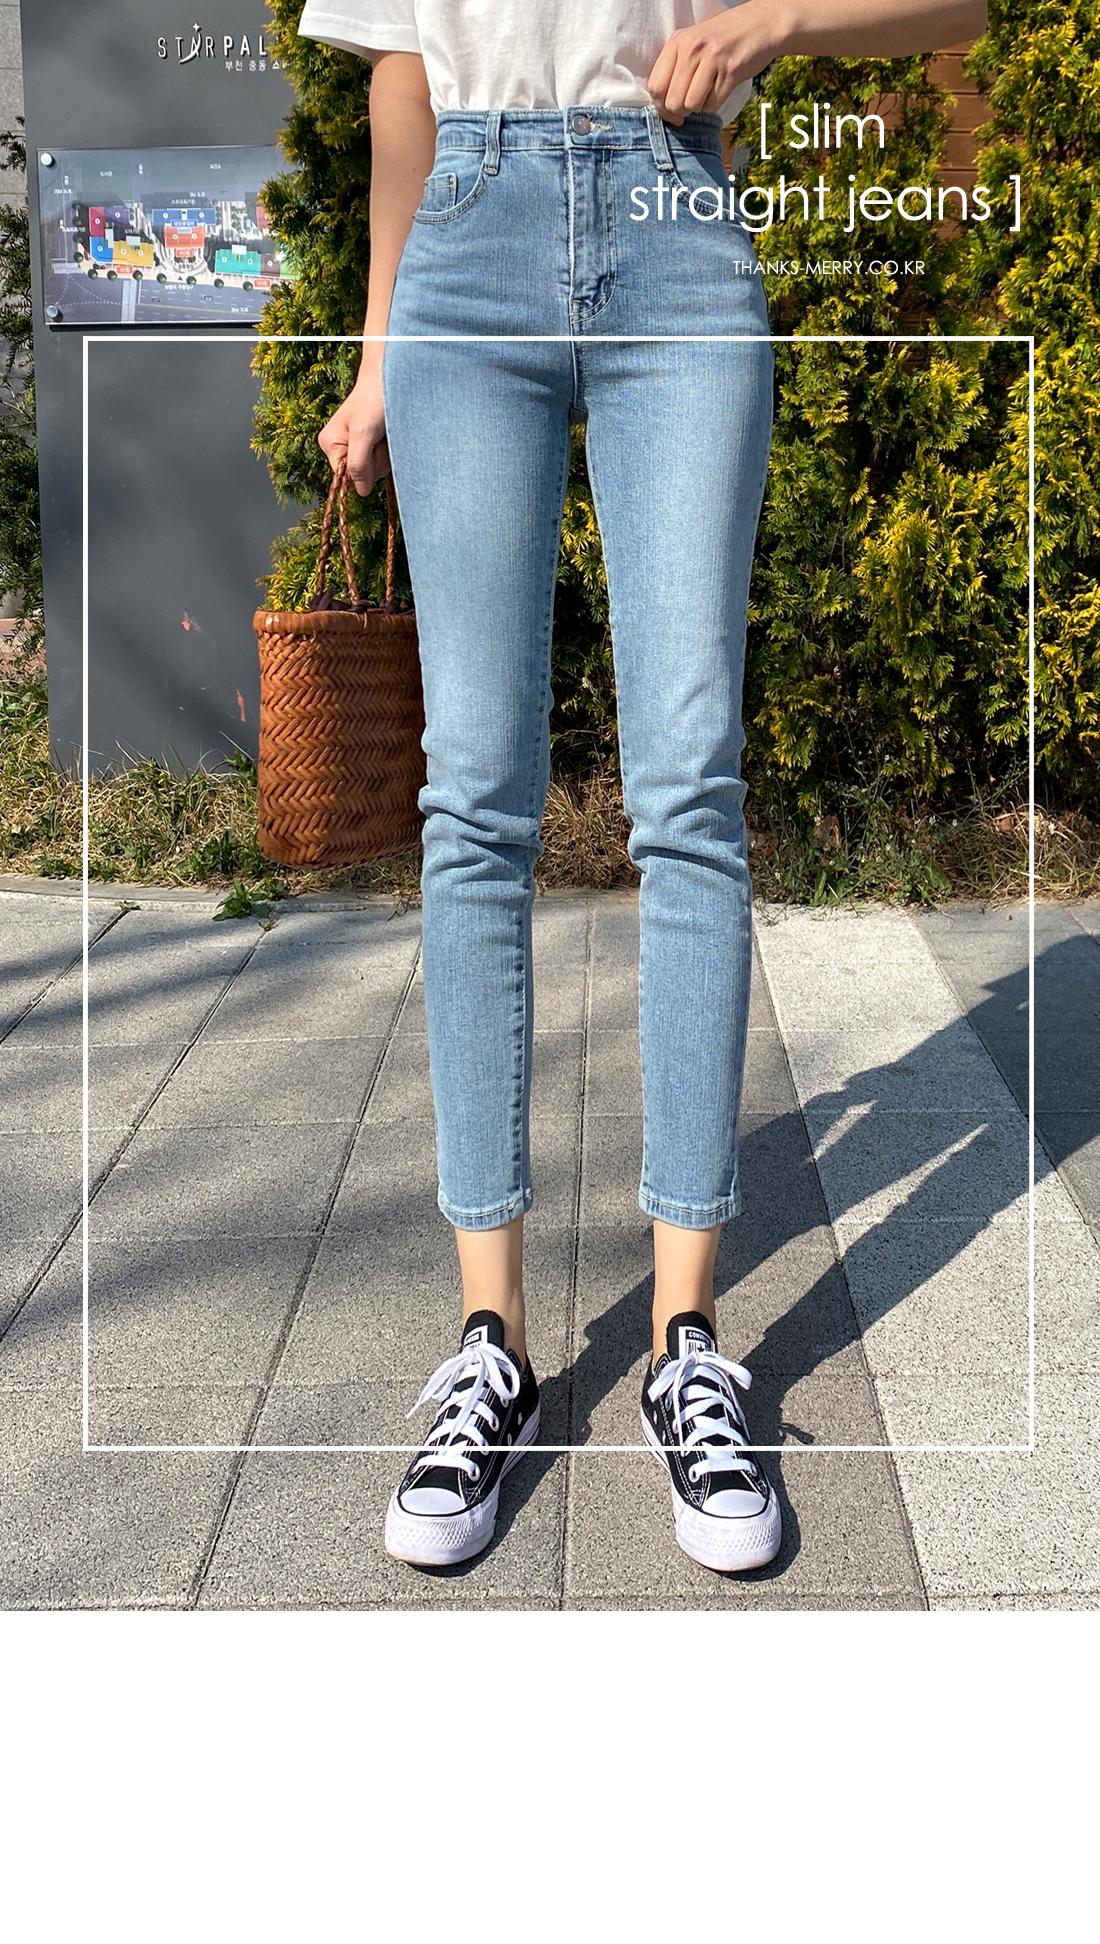 Smoked Skinny Slim Date Jeans